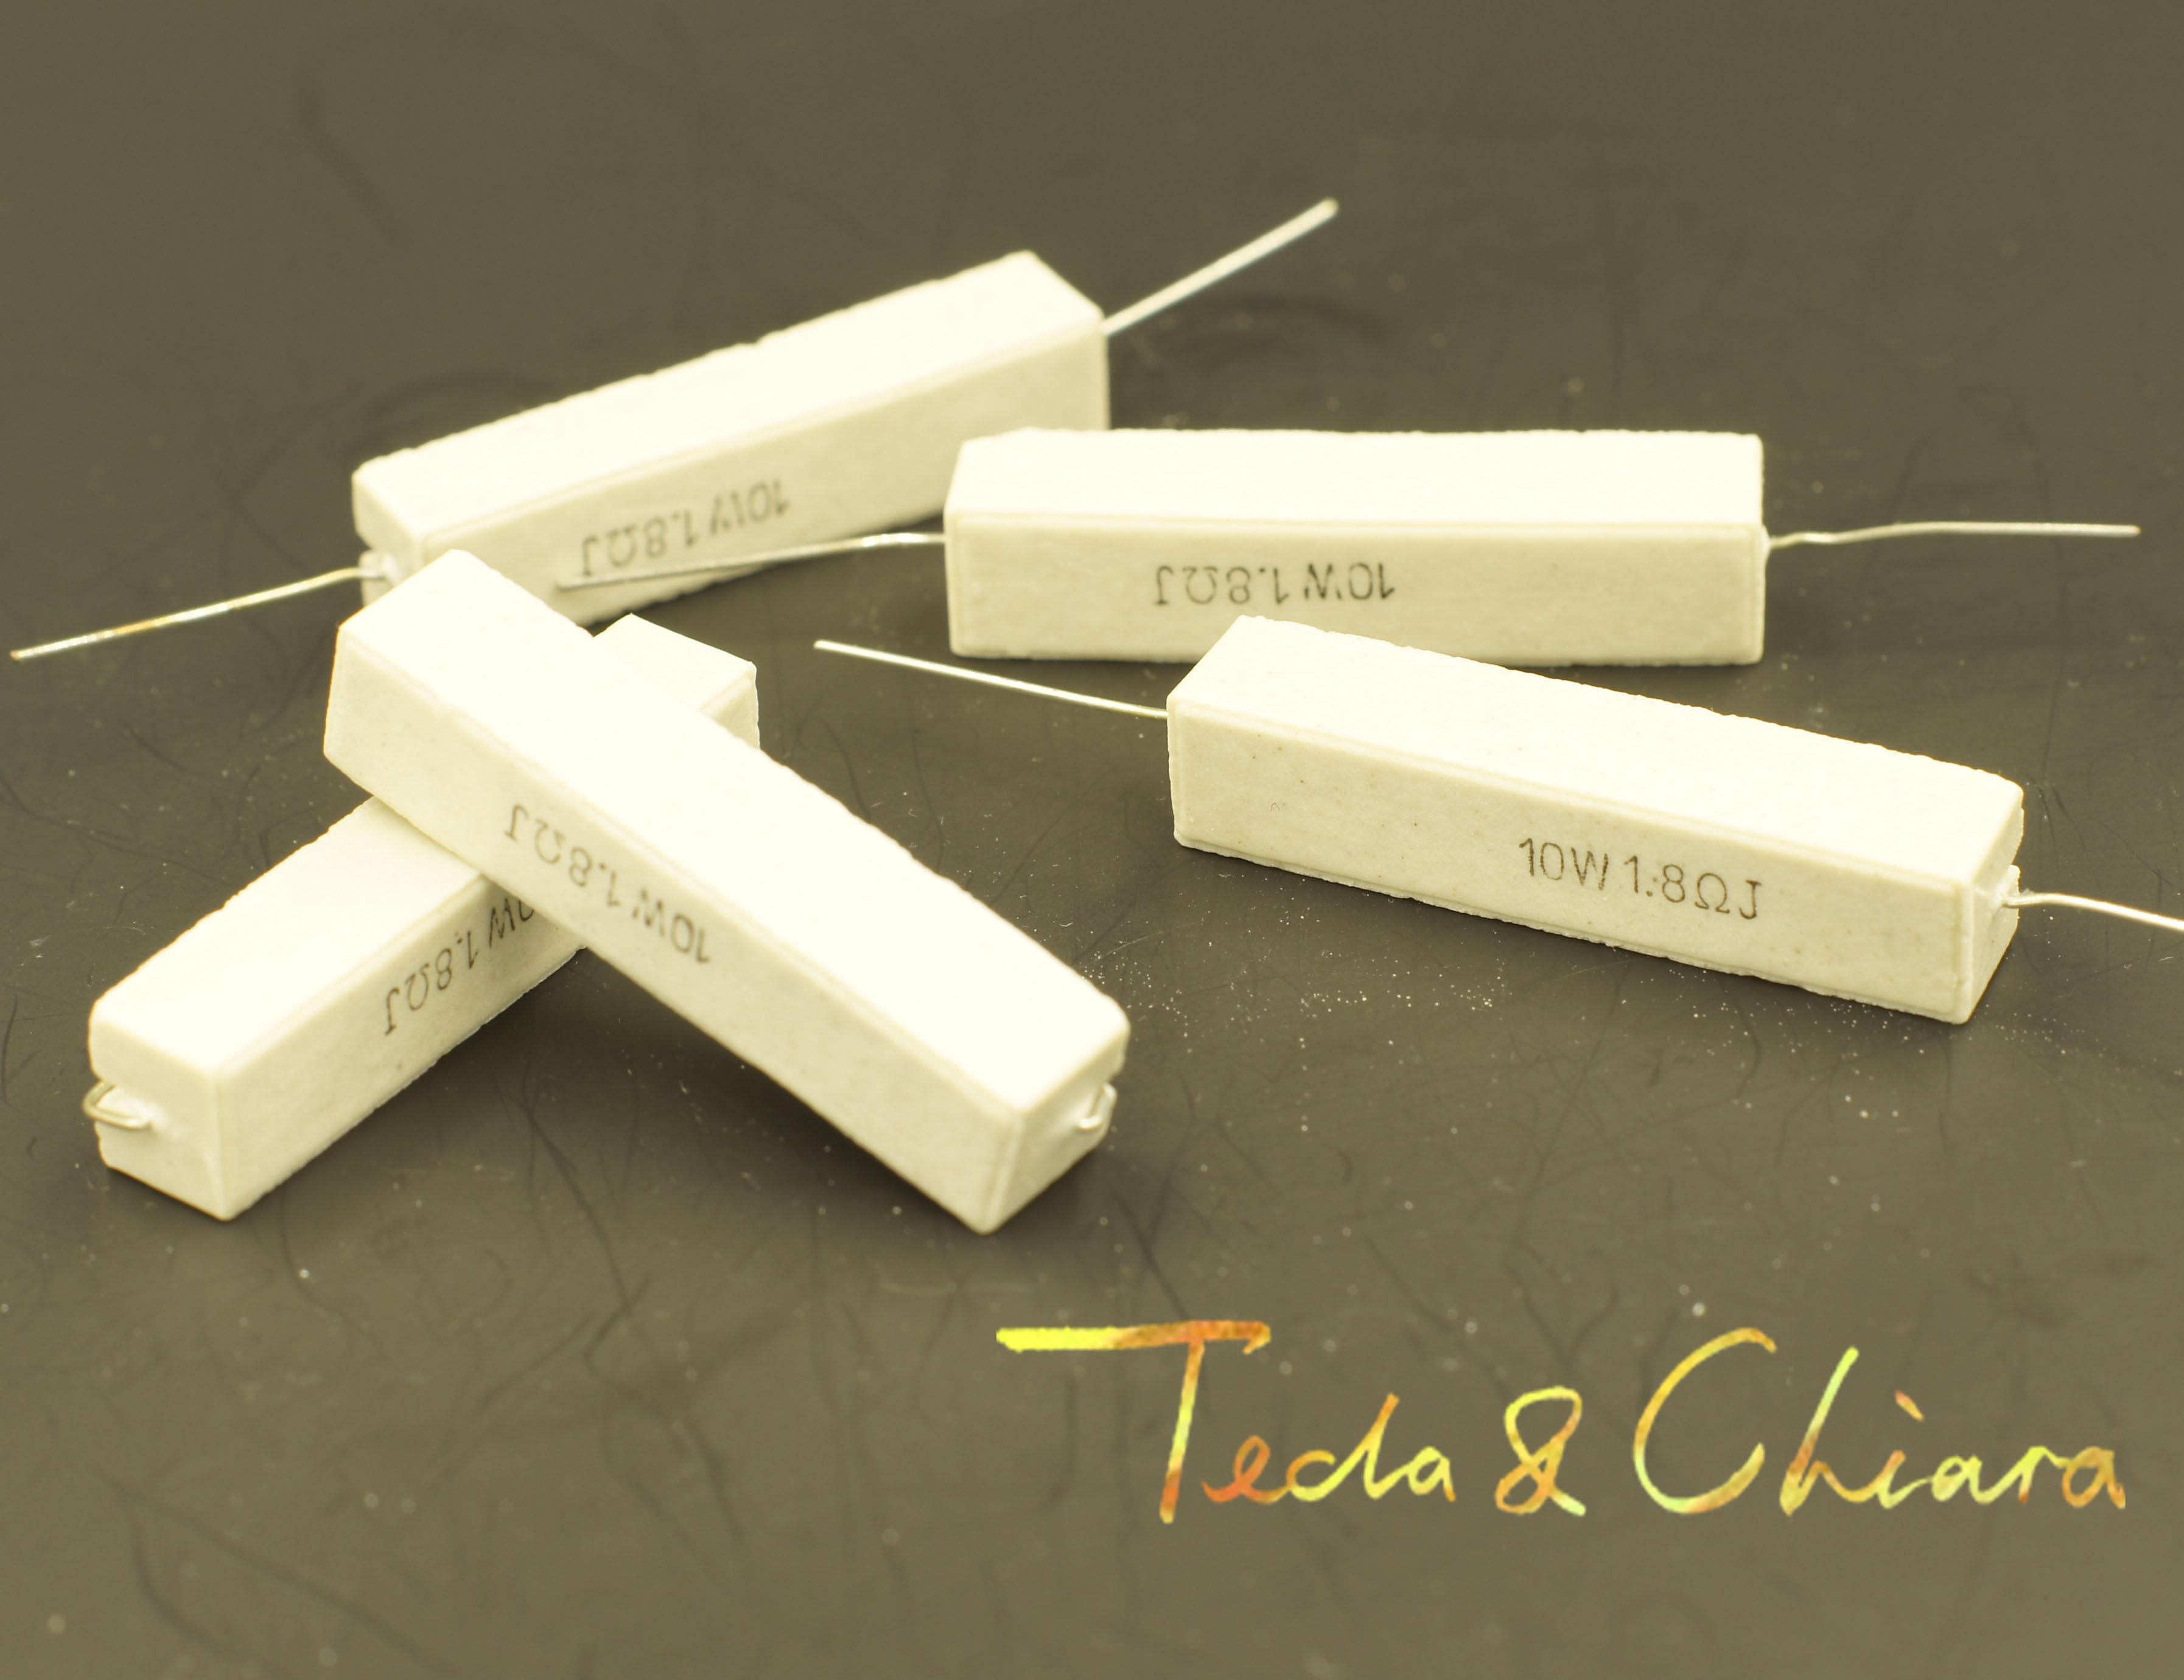 10Pcs 10W 15R 18R 20R 22R 15ohm 18ohm 20ohm 22ohm 15 18 20 22 5% Cement Ceramic Power Horizontal Resistor Resistance R Ohm